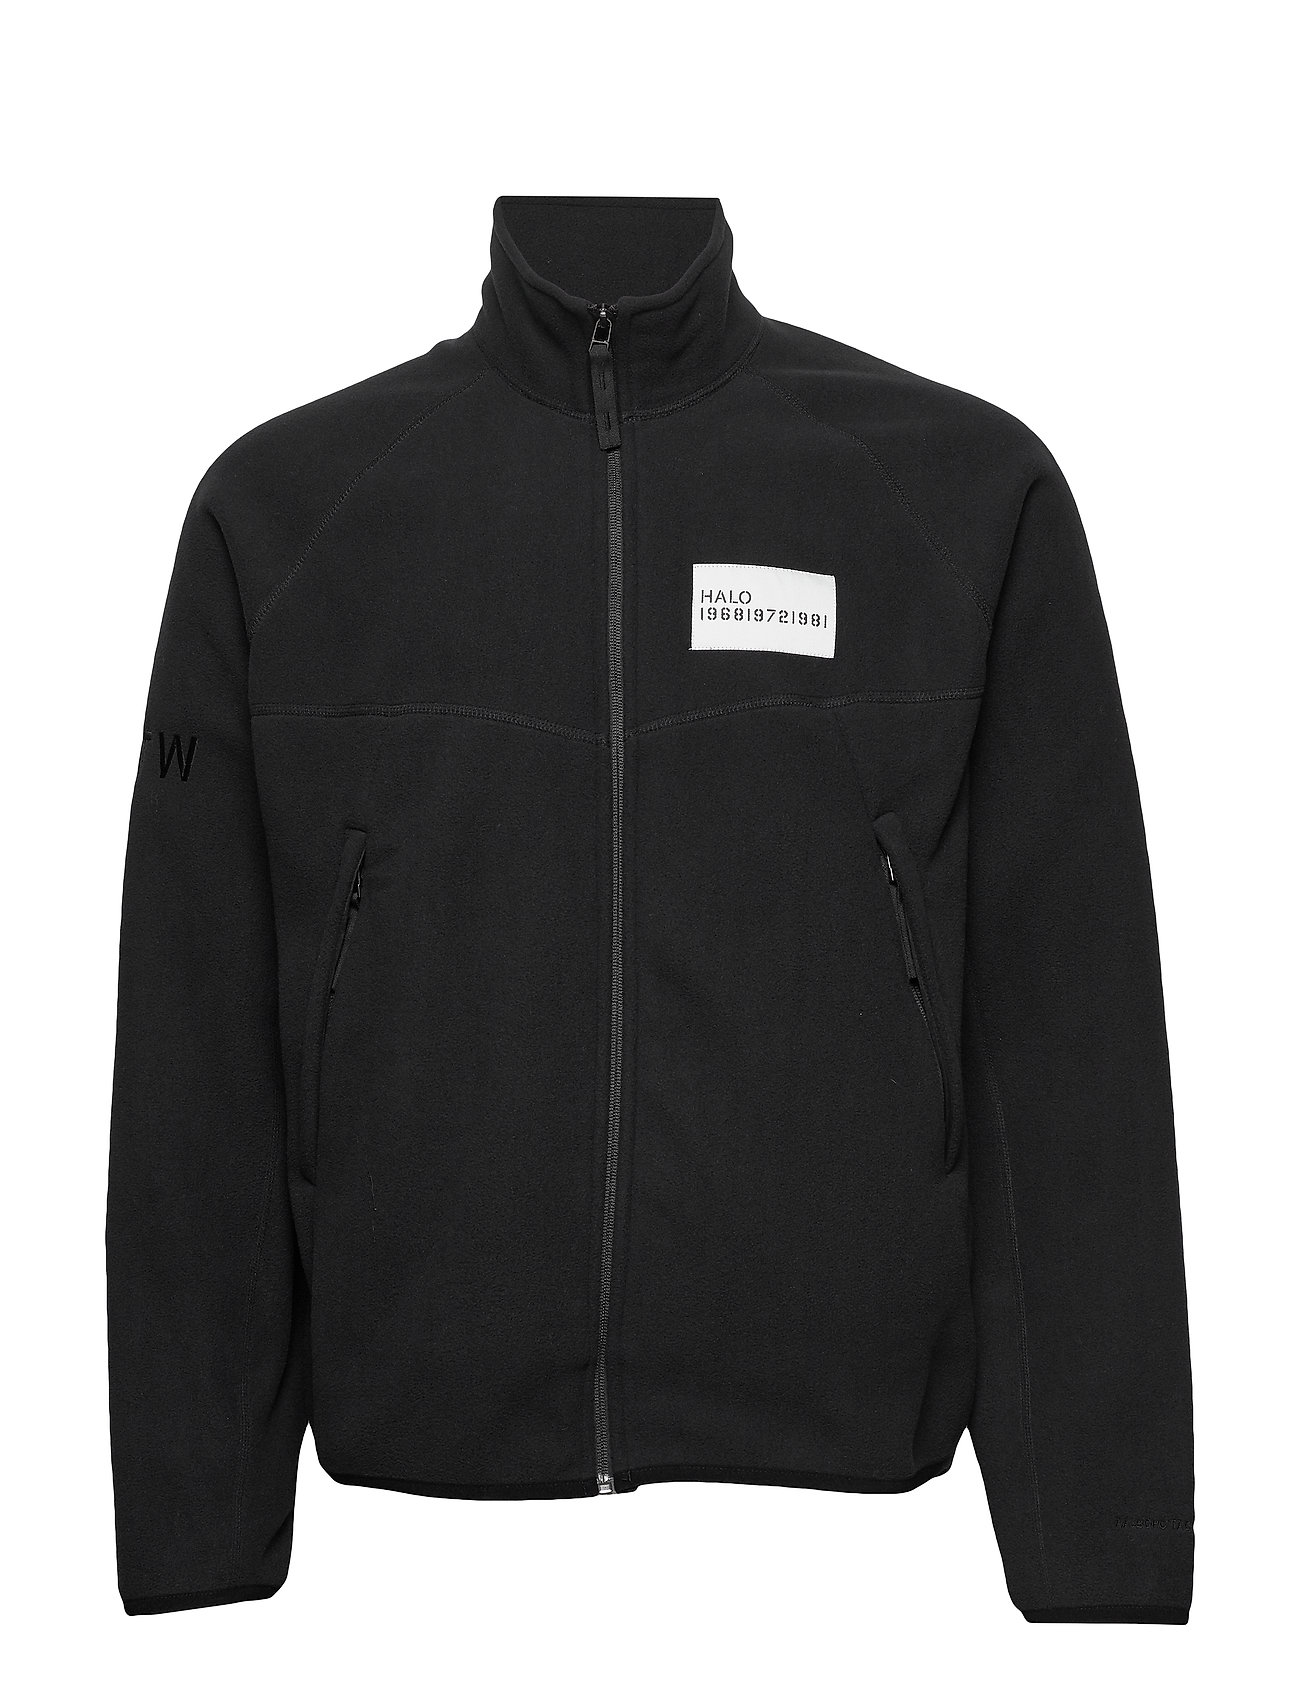 HALO HALO ATW Zip Fleece - BLACK